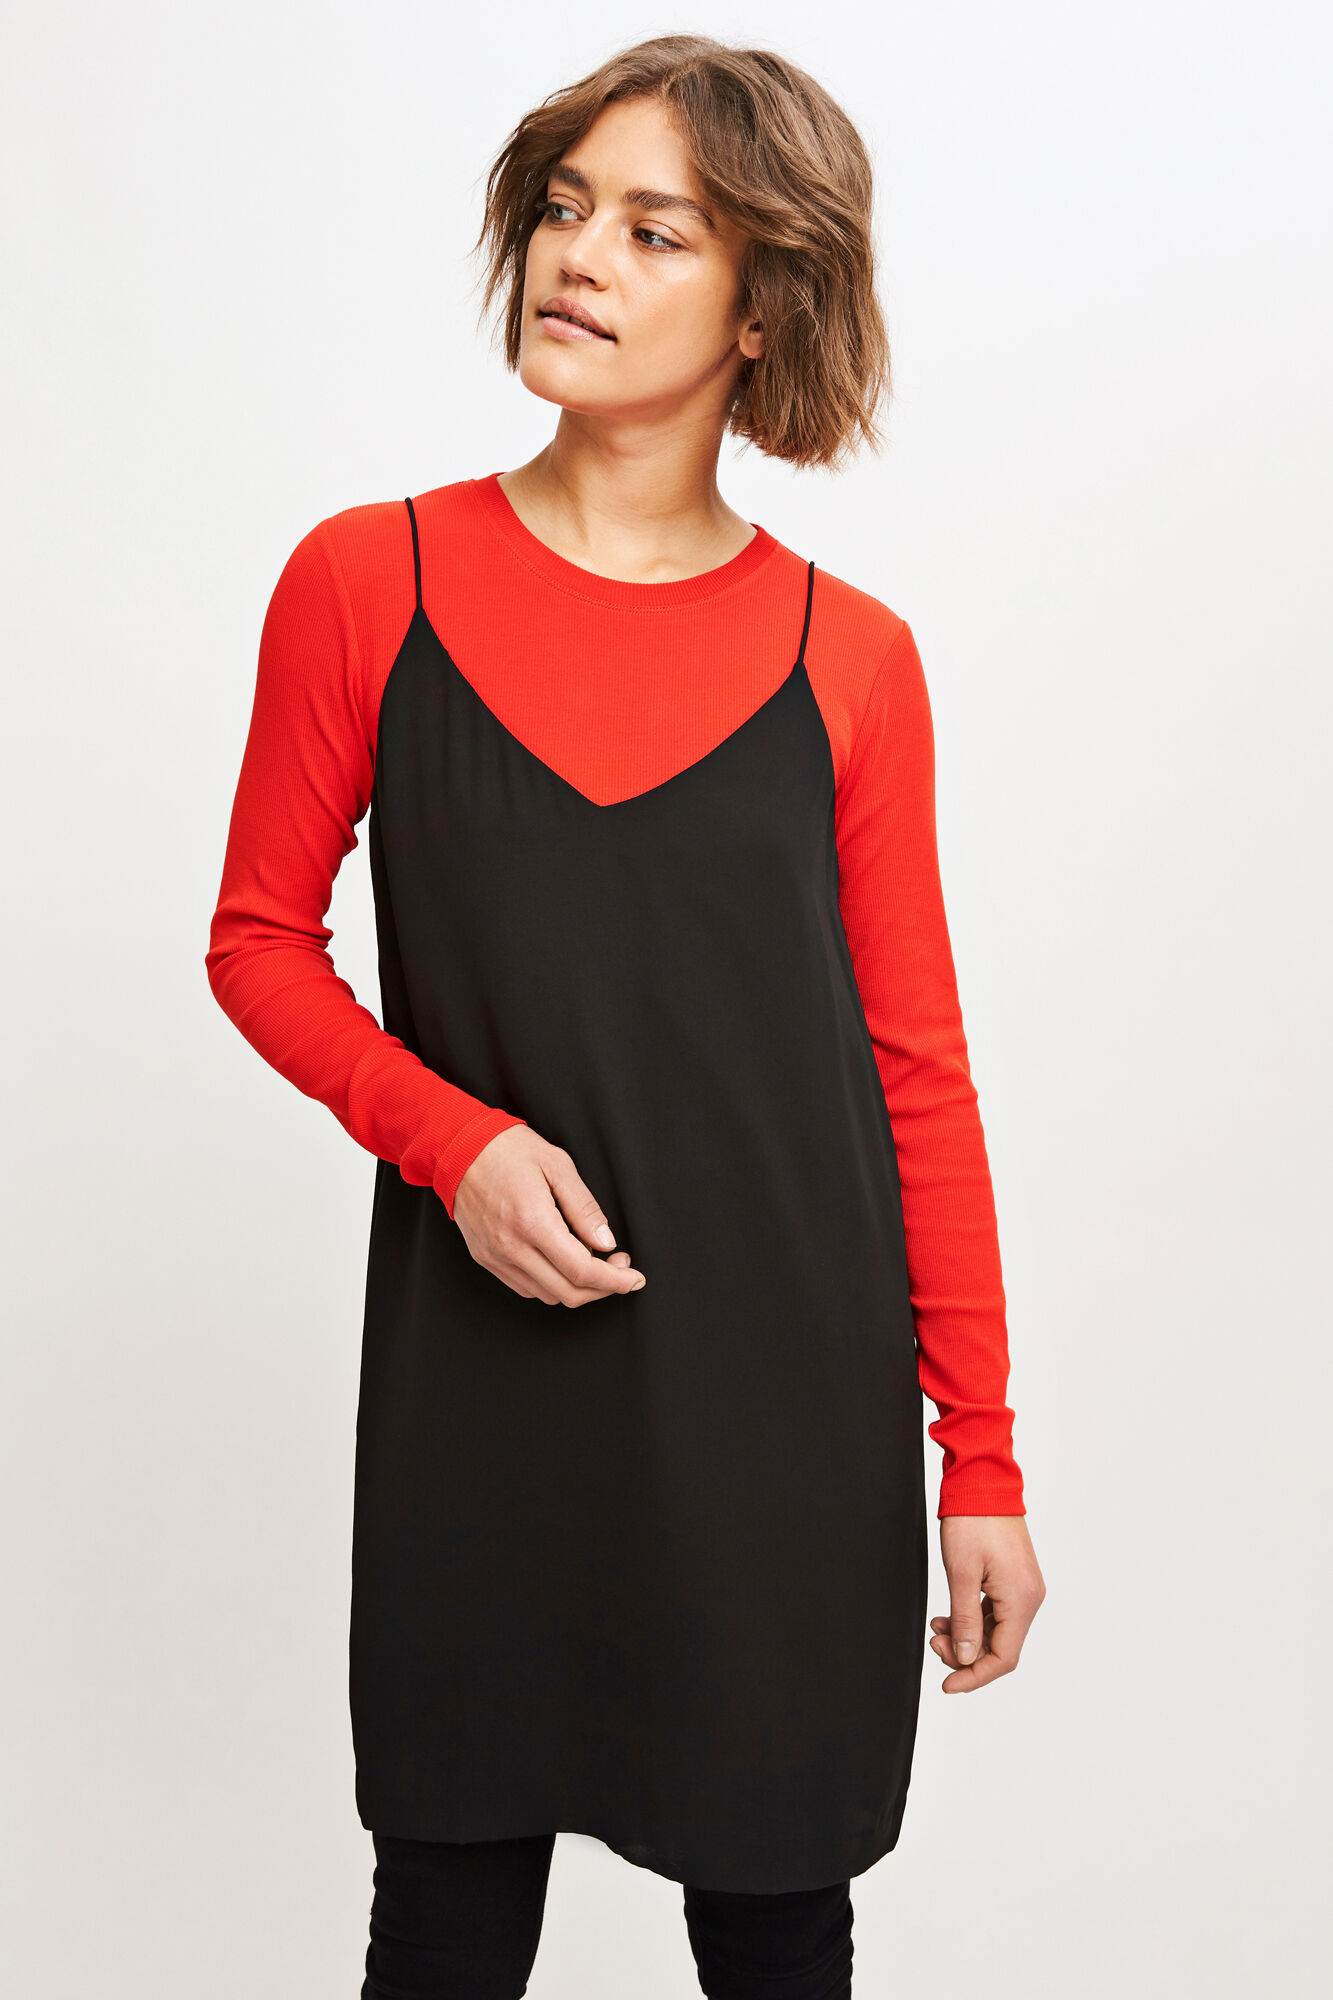 Mano dress 3974